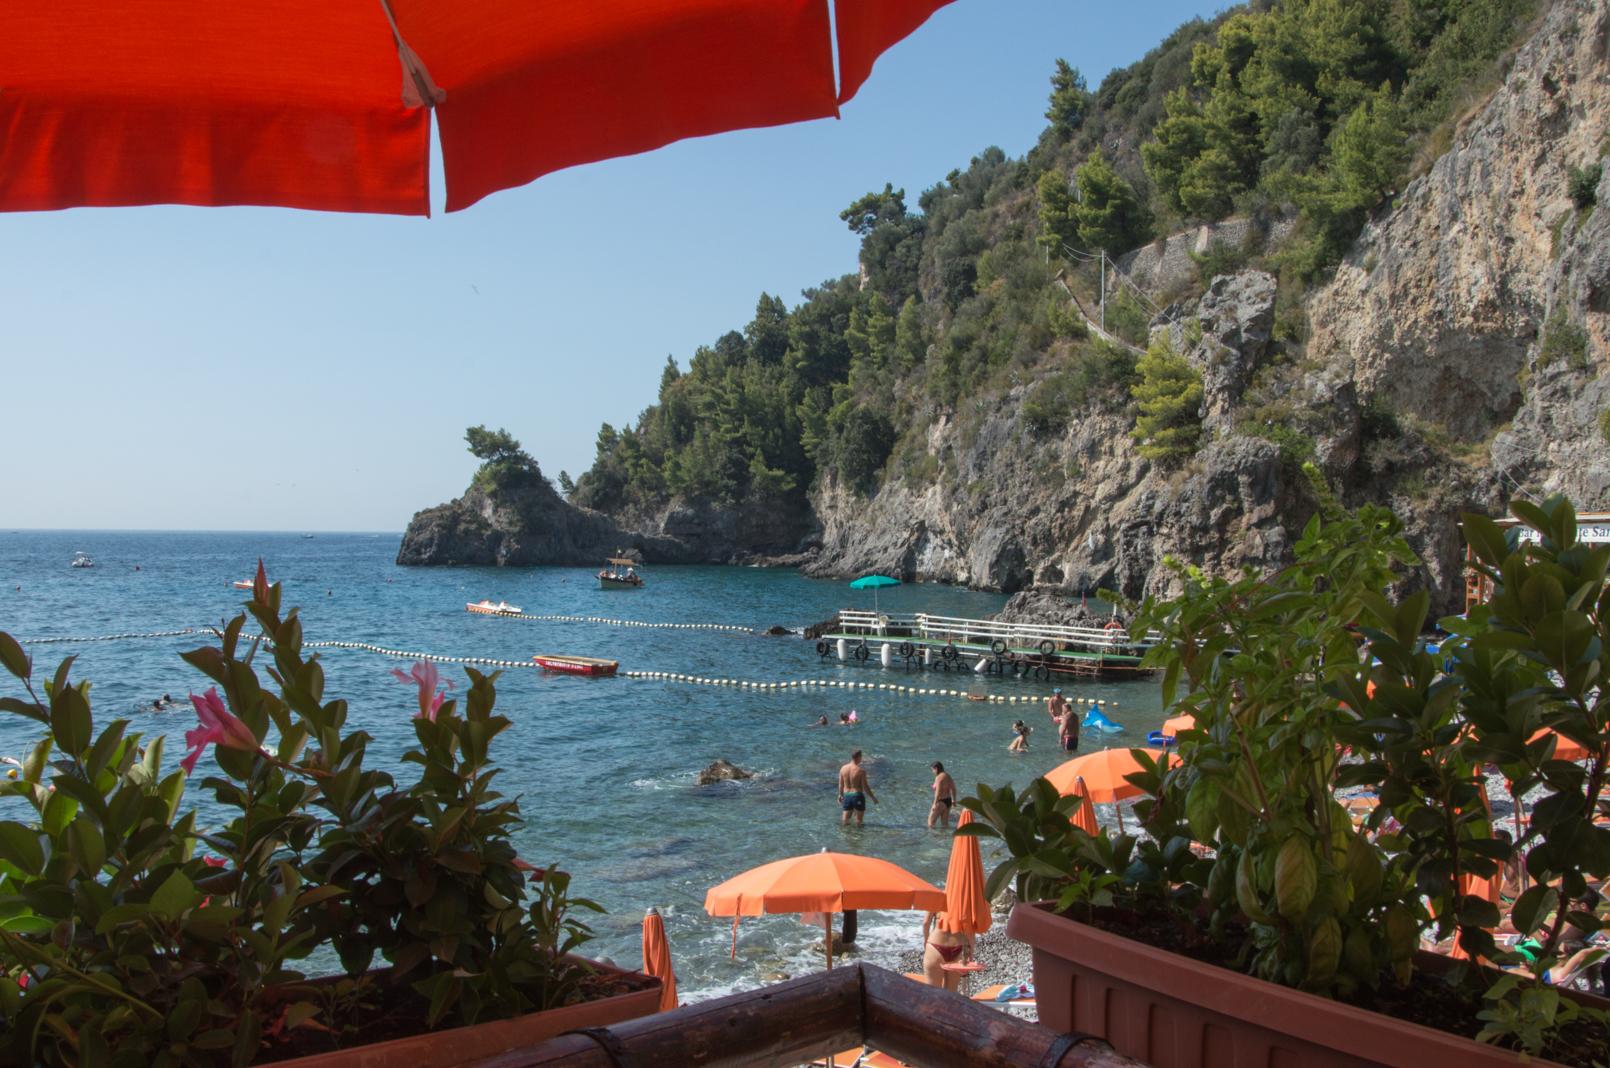 ciao-amalfi-santa-croce-beach-1